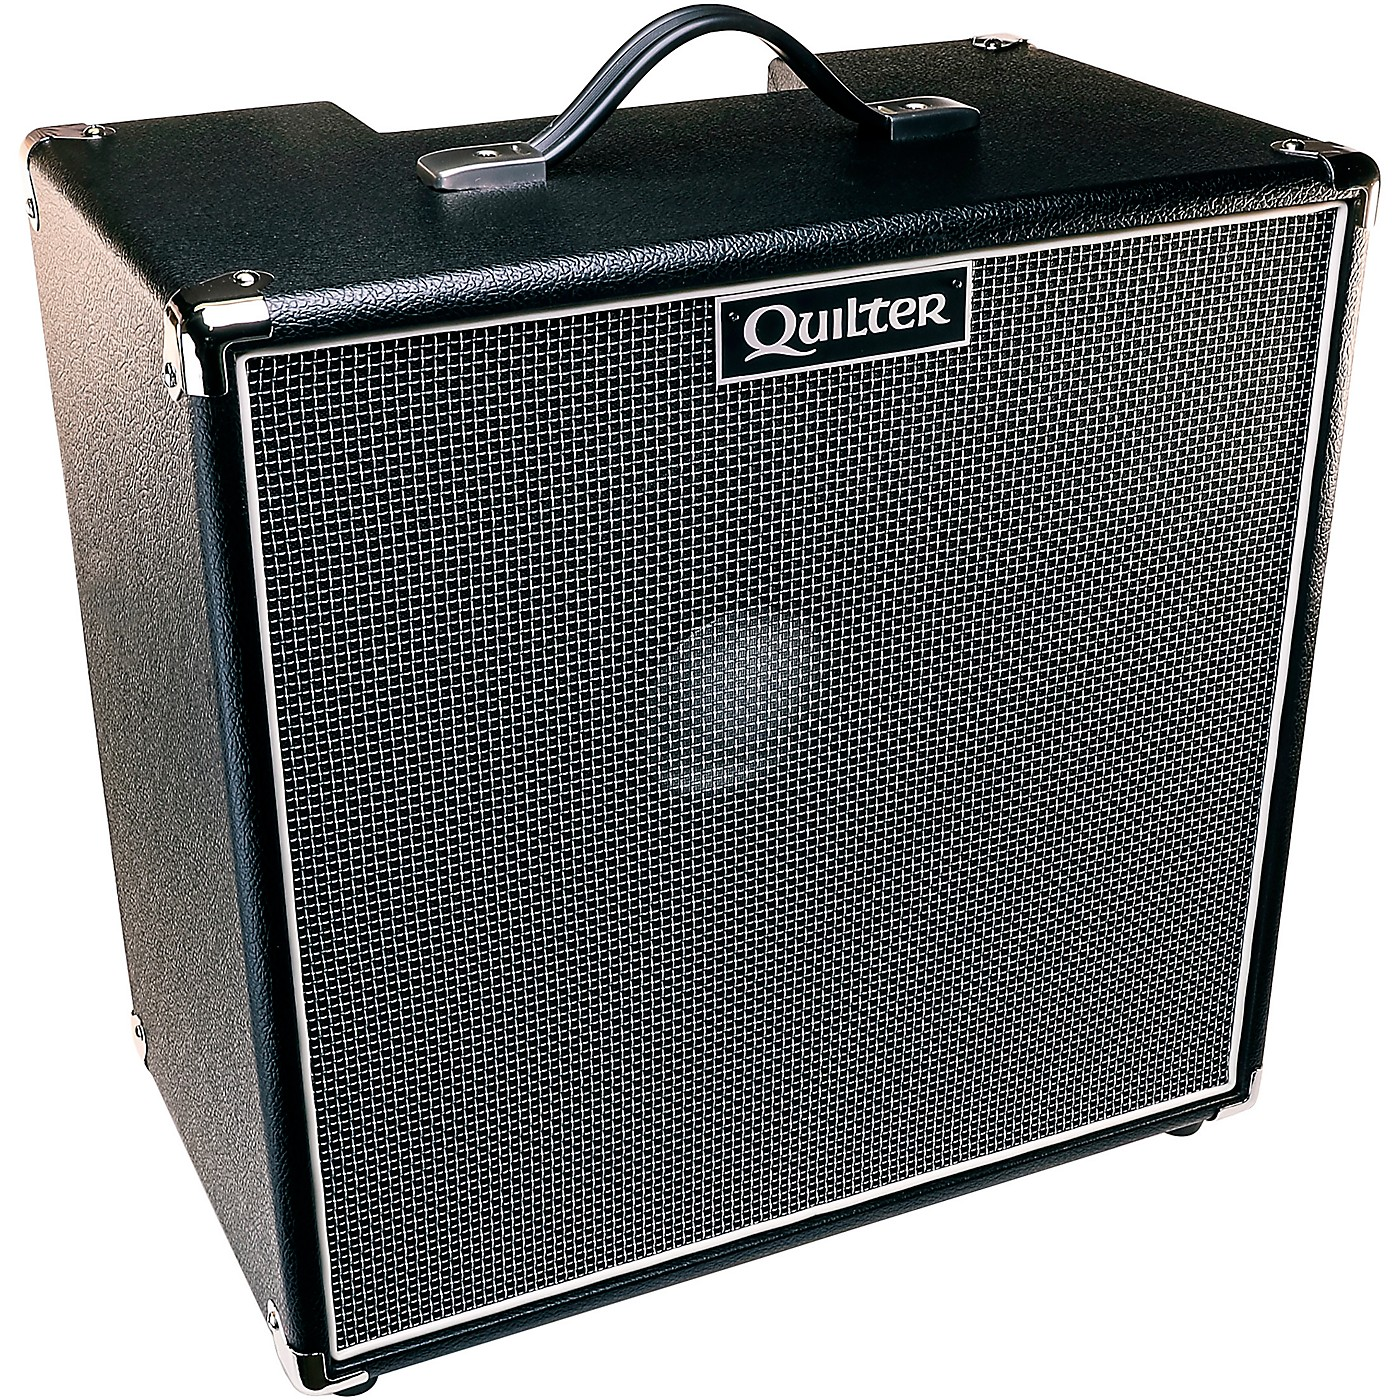 Quilter Labs BLOCKDOCK 15 1x15 Guitar Speaker Cabinet thumbnail